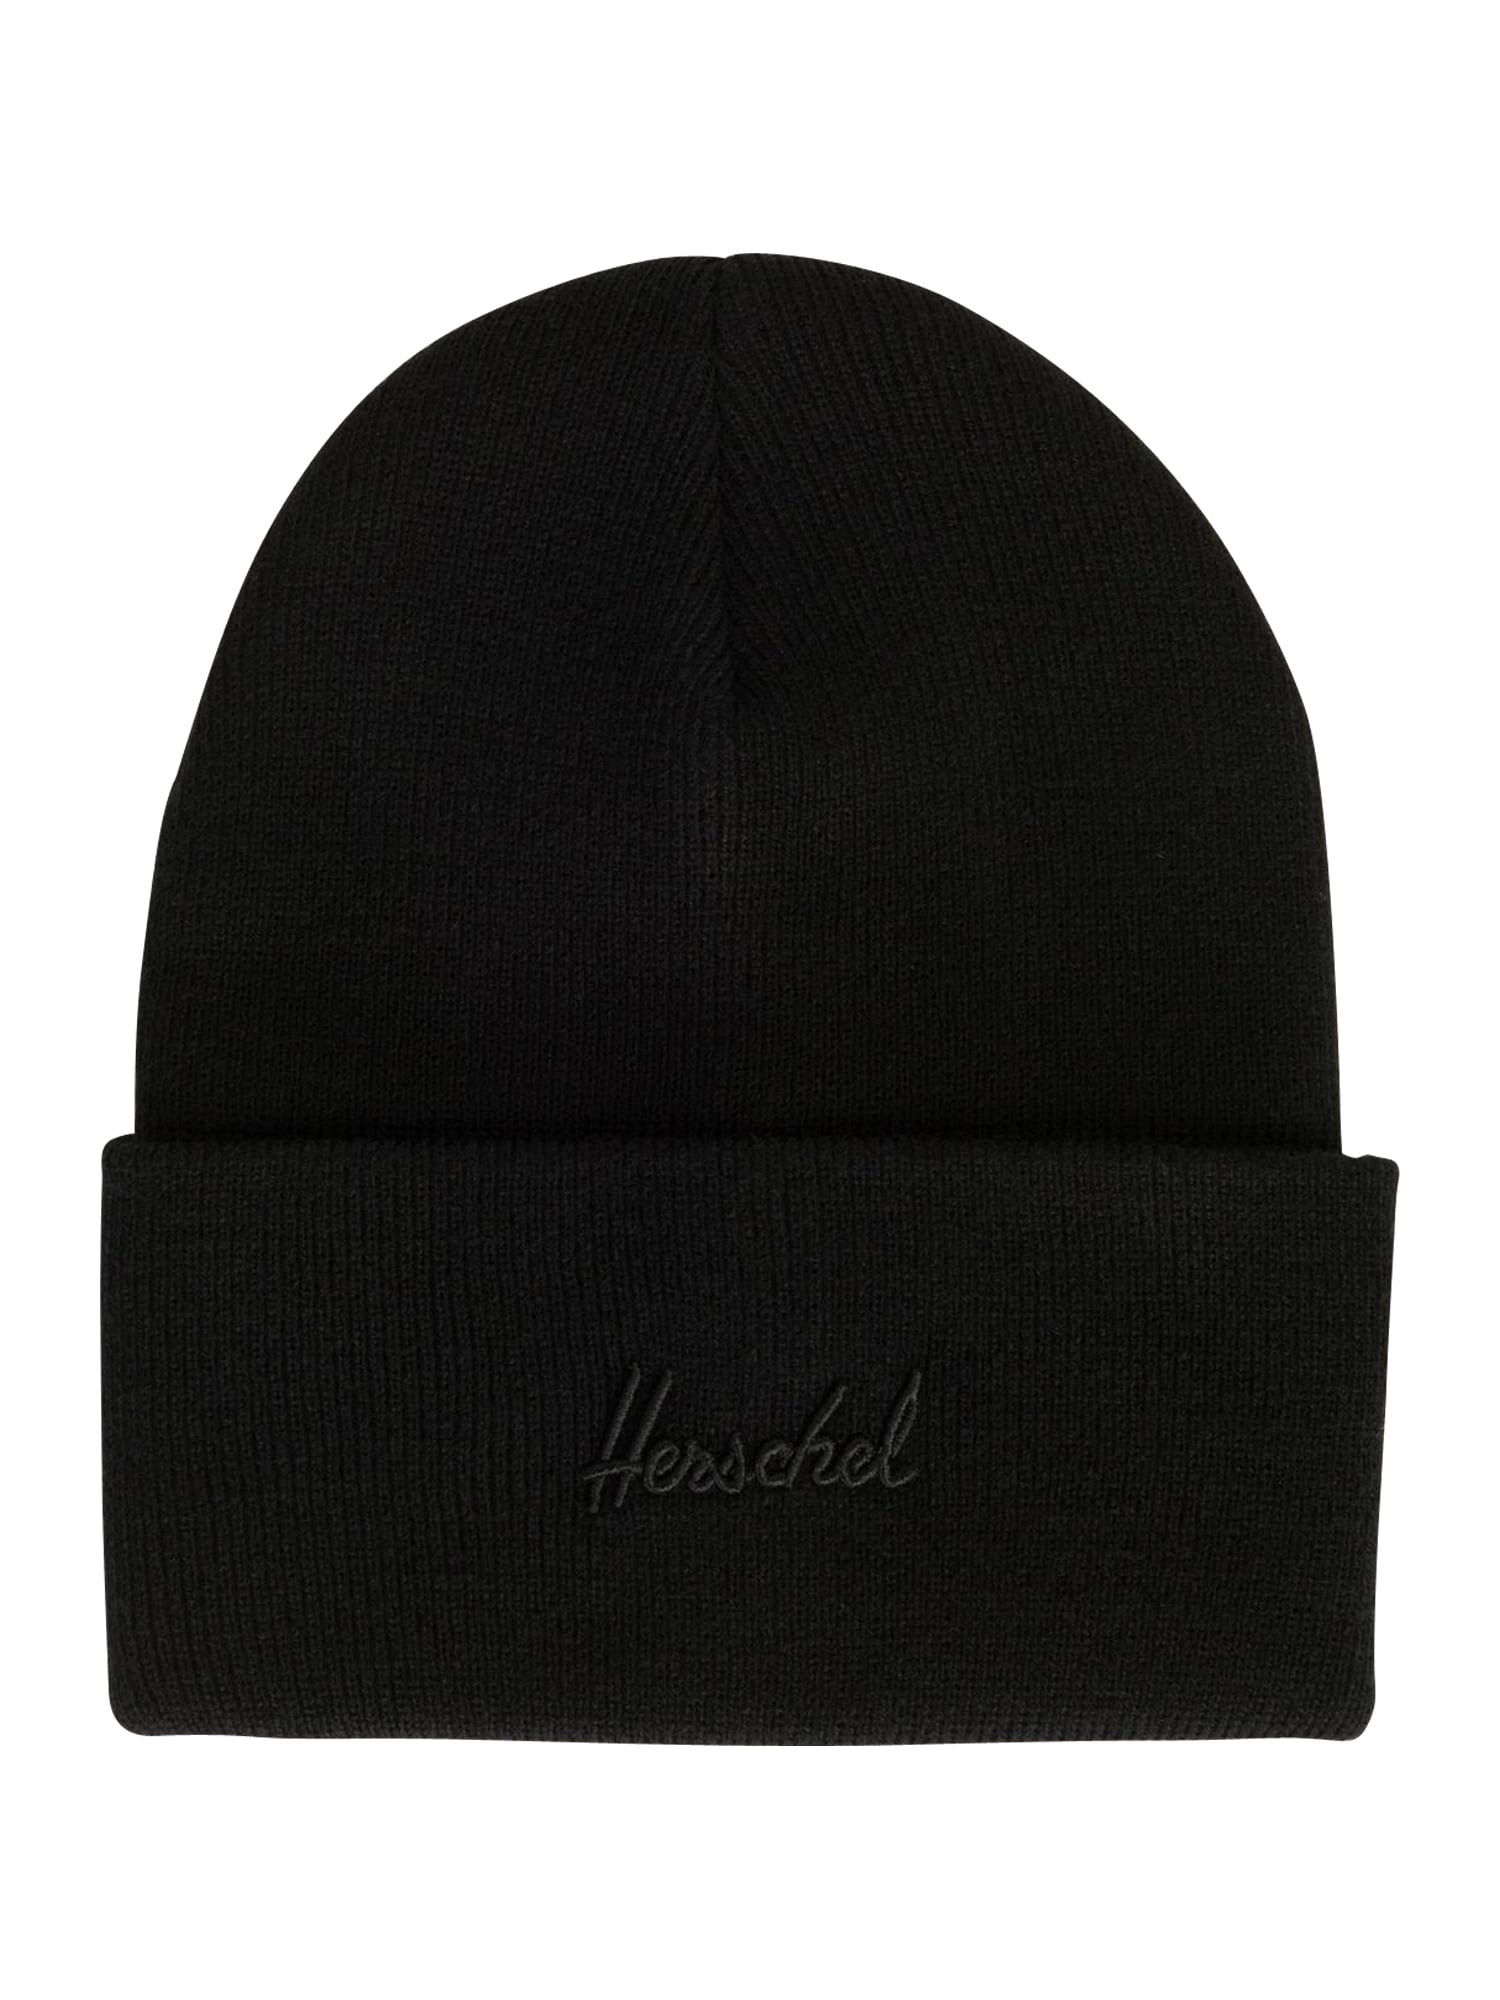 Herschel Megzta kepurė 'Aden' juoda